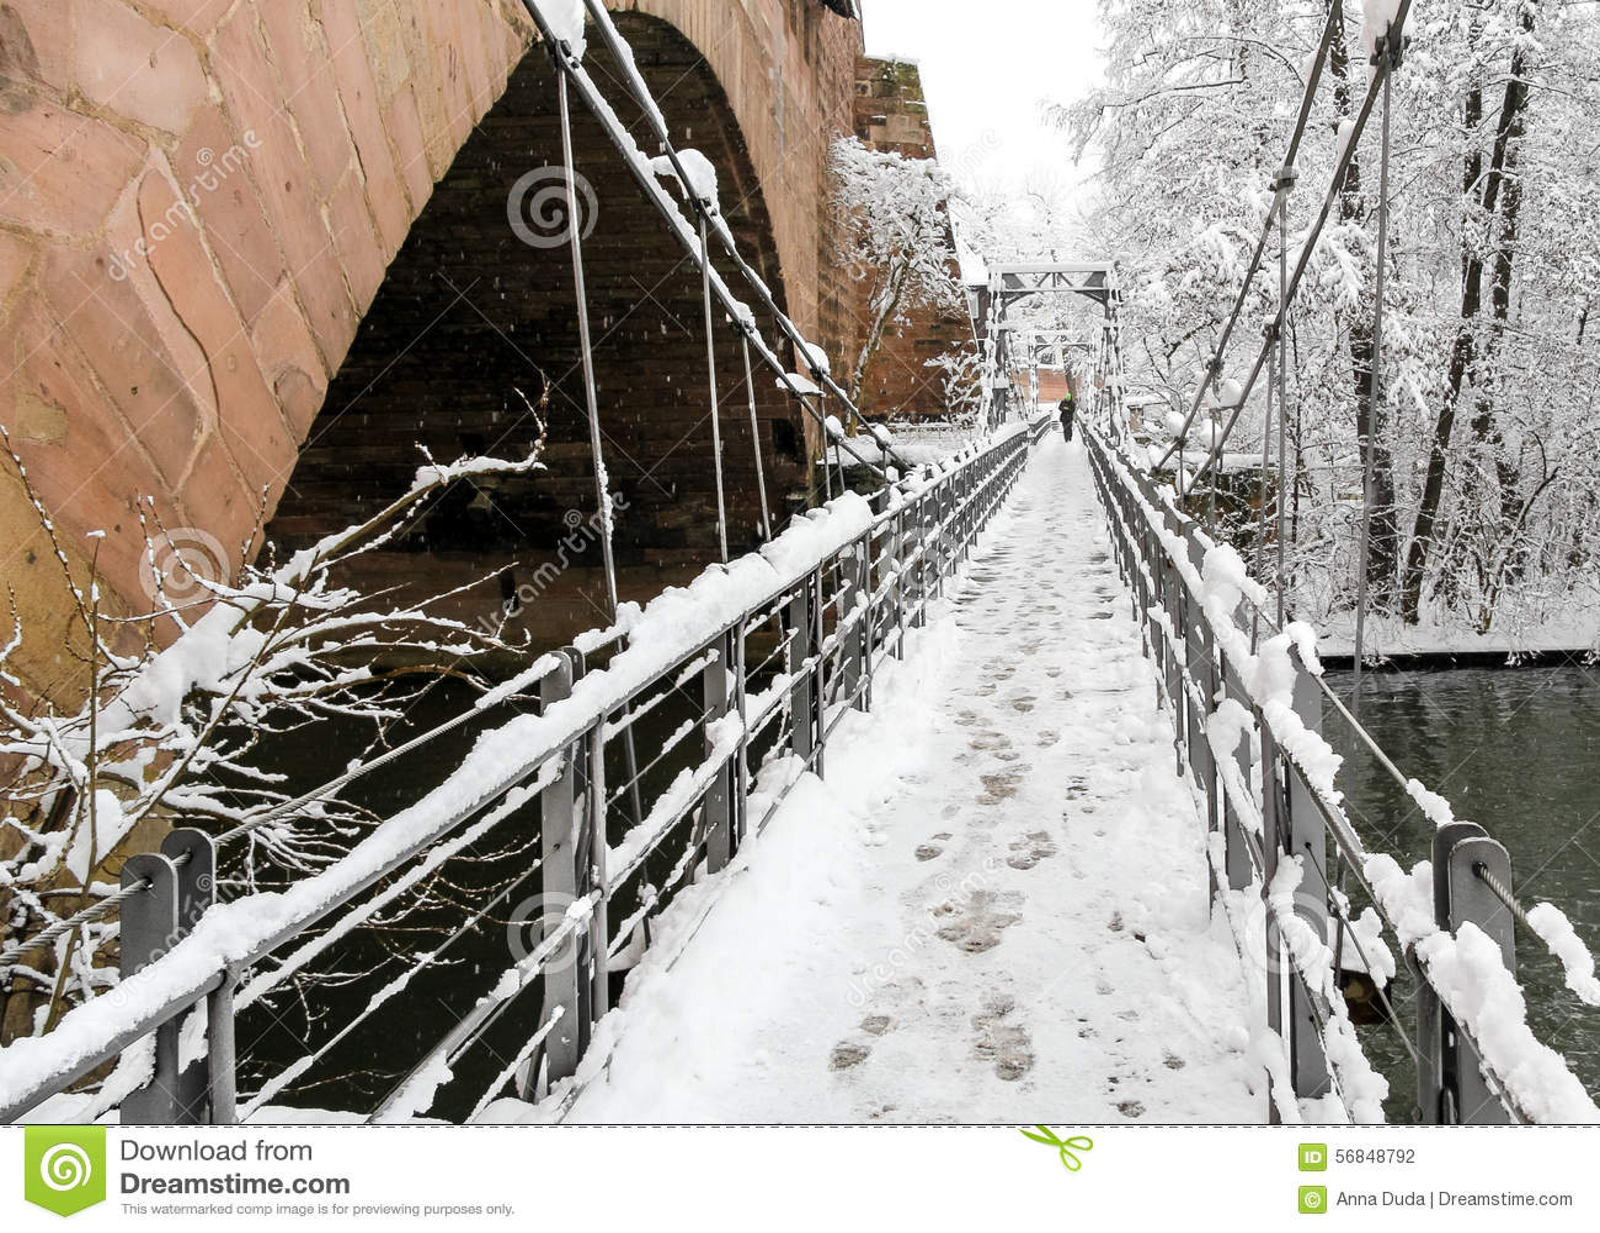 Snowy Nuremberg, Germany- iron bridge ( Kettensteg), old town city walls